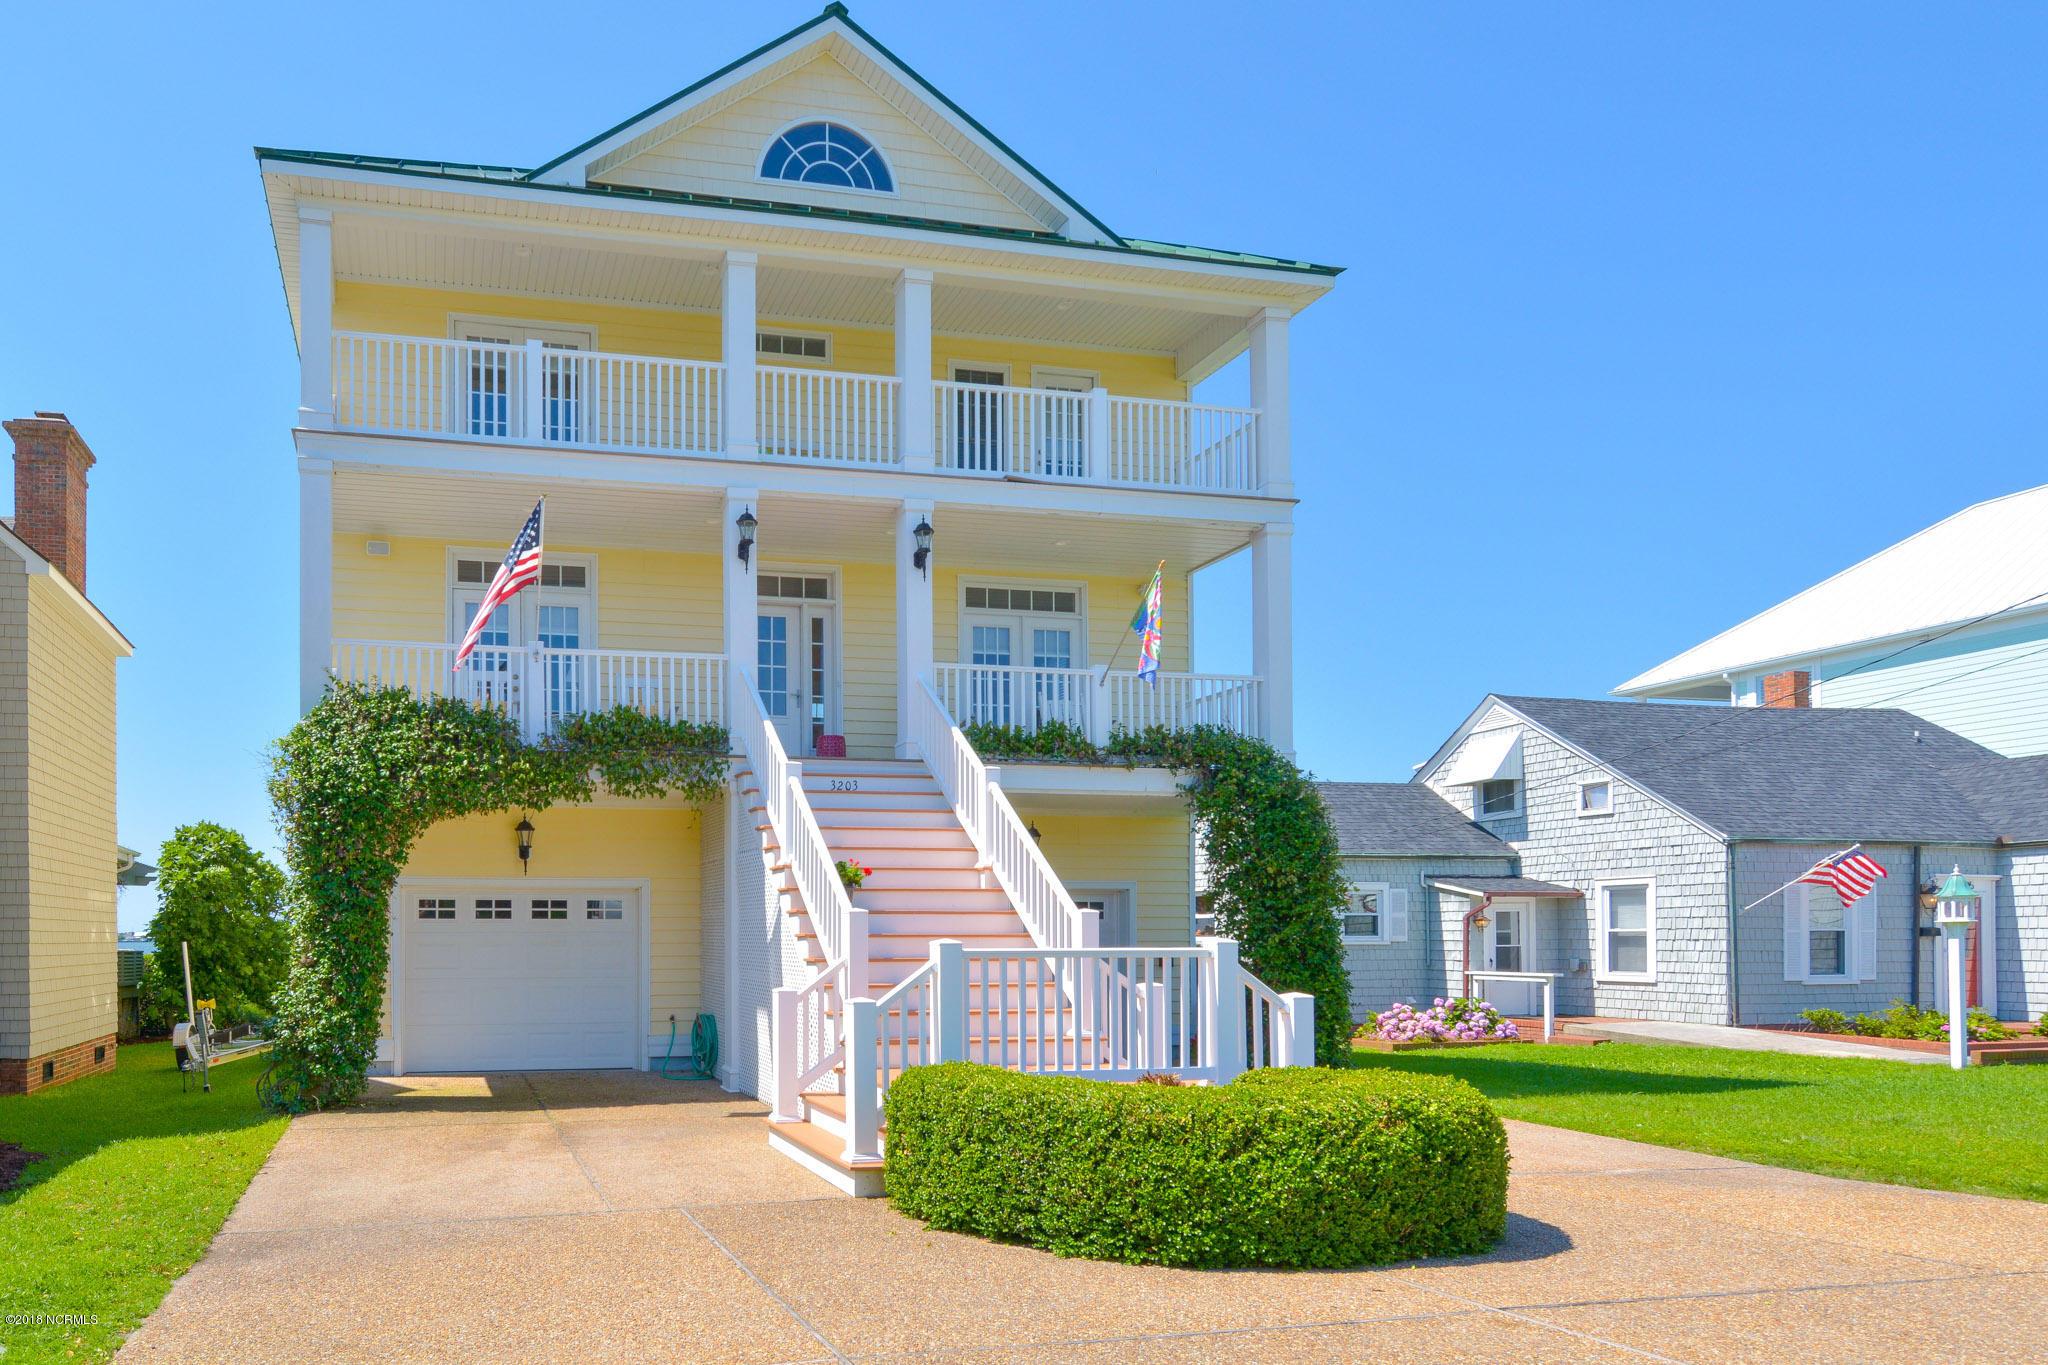 3203 Evans Street, Morehead City, North Carolina, 4 Bedrooms Bedrooms, 7 Rooms Rooms,4 BathroomsBathrooms,Single family residence,For sale,Evans,100133023